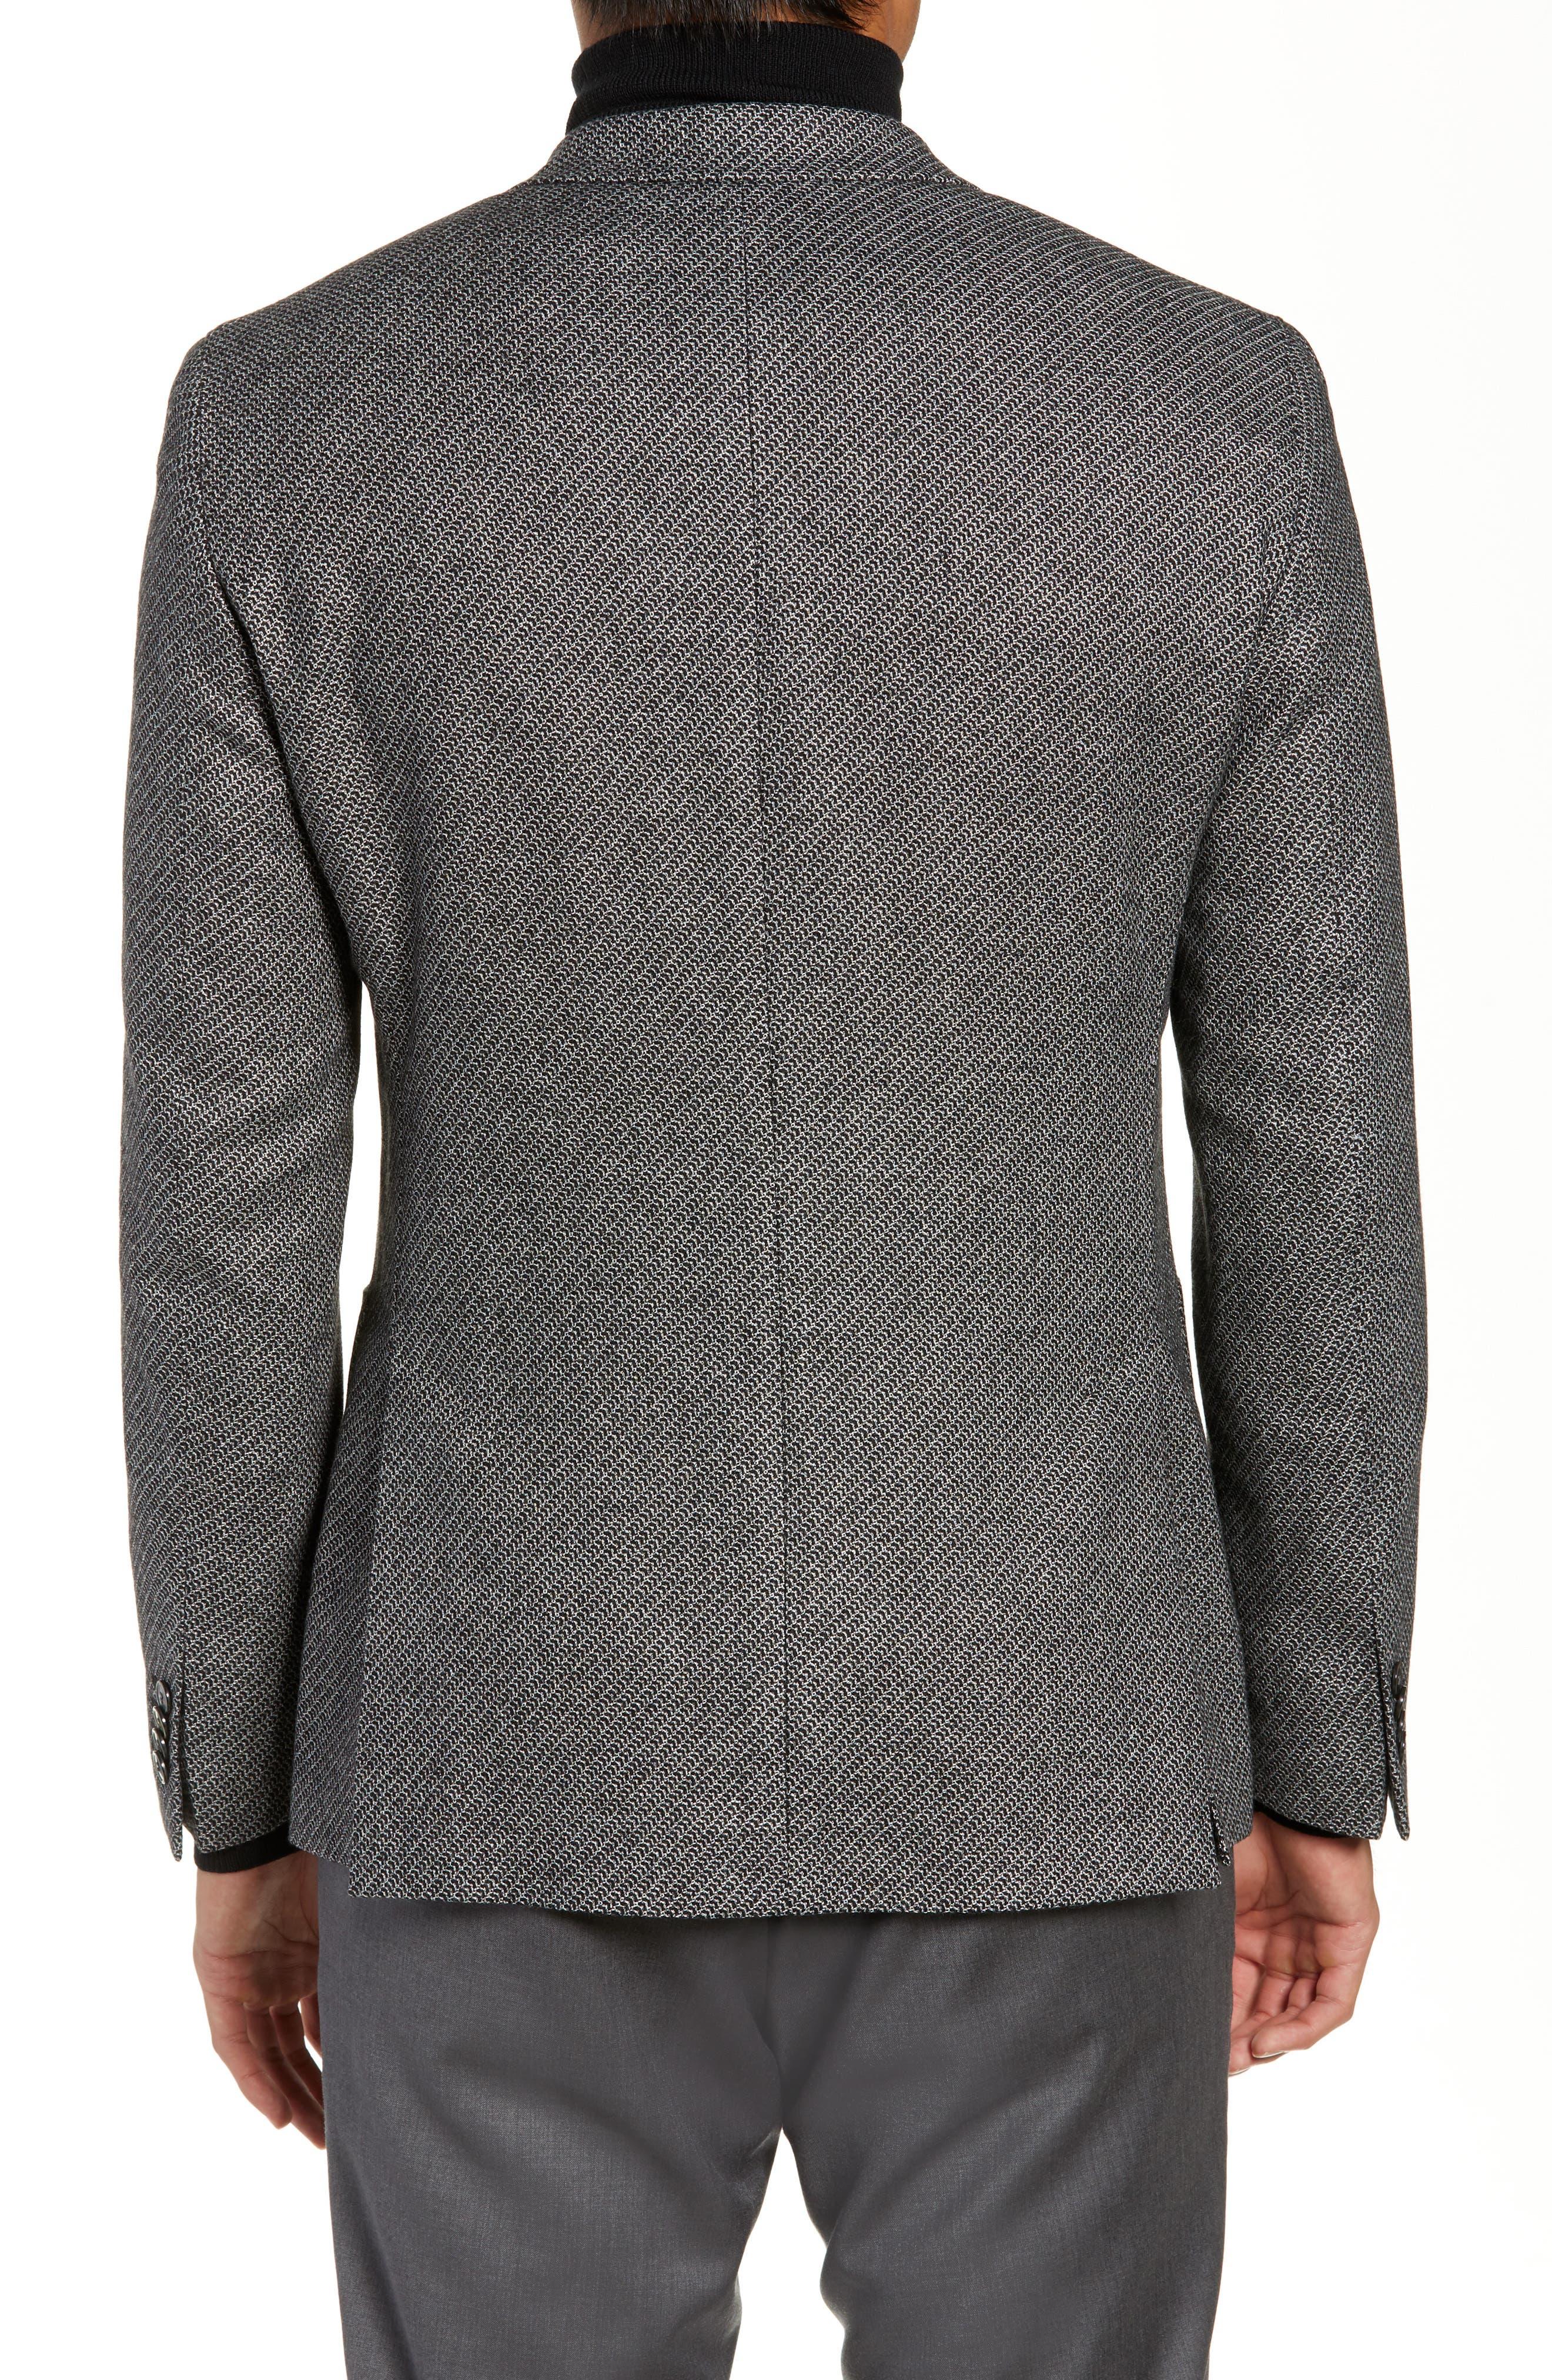 Raye Extra Trim Fit Wool Blend Blazer,                             Alternate thumbnail 2, color,                             DARK GREY